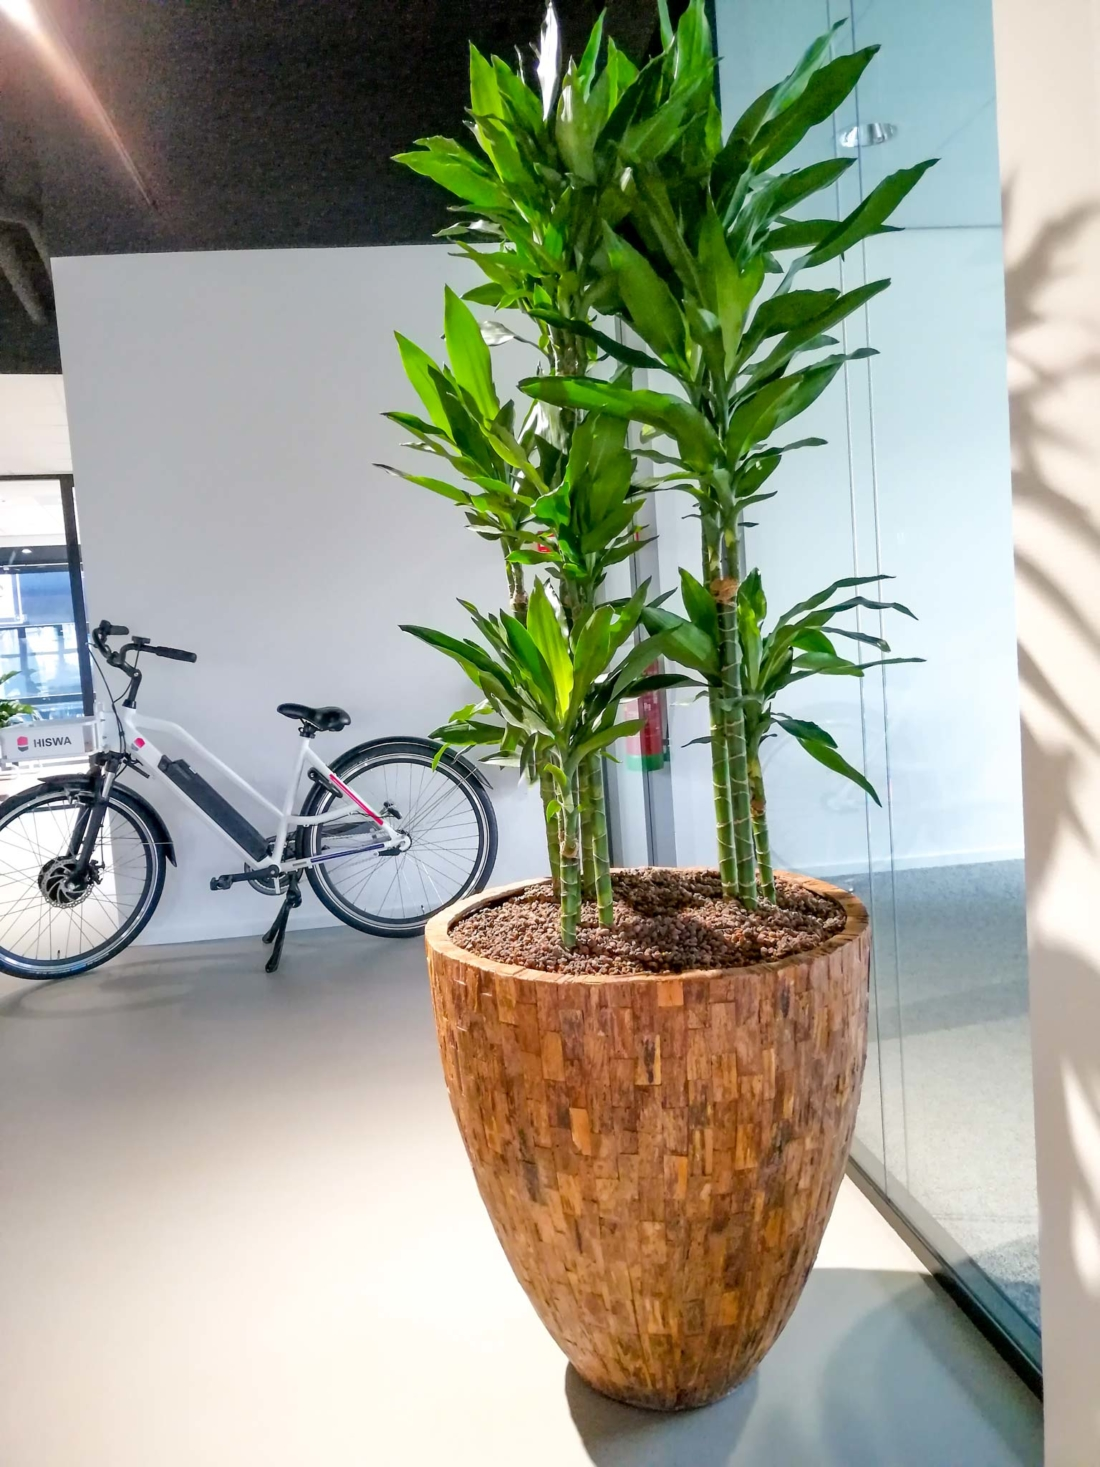 Cemani-wood-plantenbak-met-dracaena-kantoorplant-1100x1467.jpg